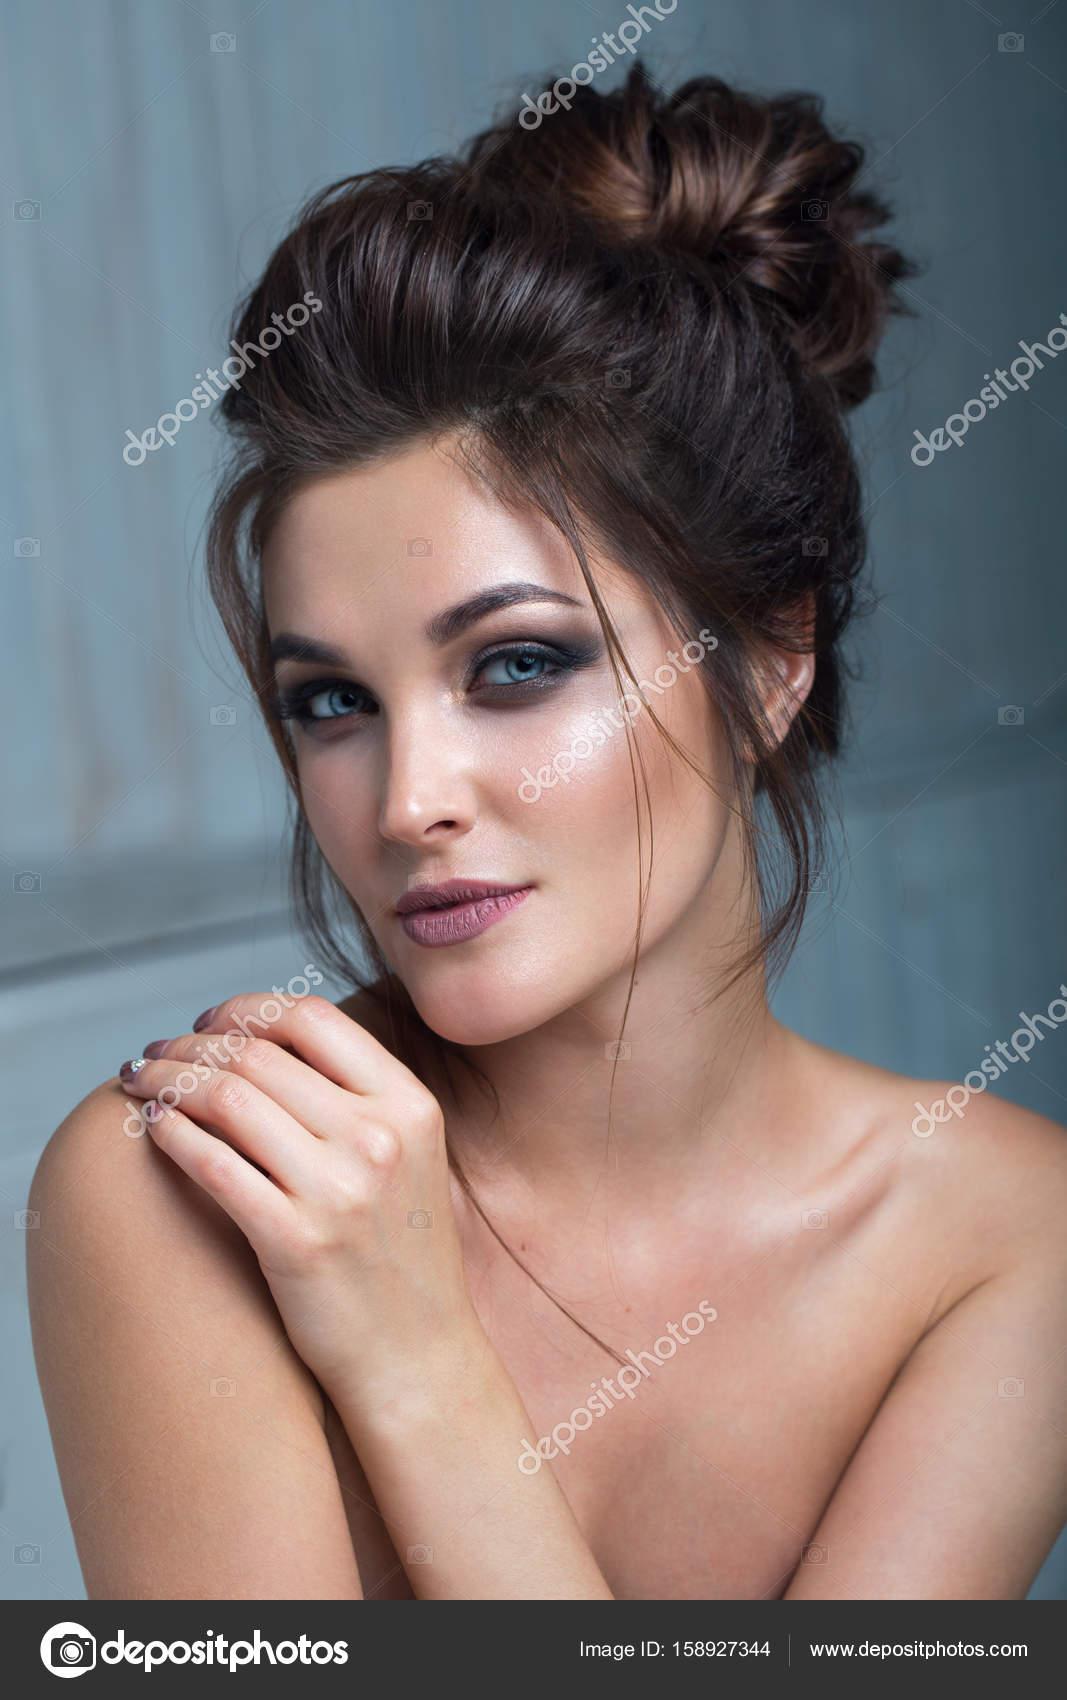 Fille De Beau Modele Avec Une Coiffure Elegante Femme A La Mode